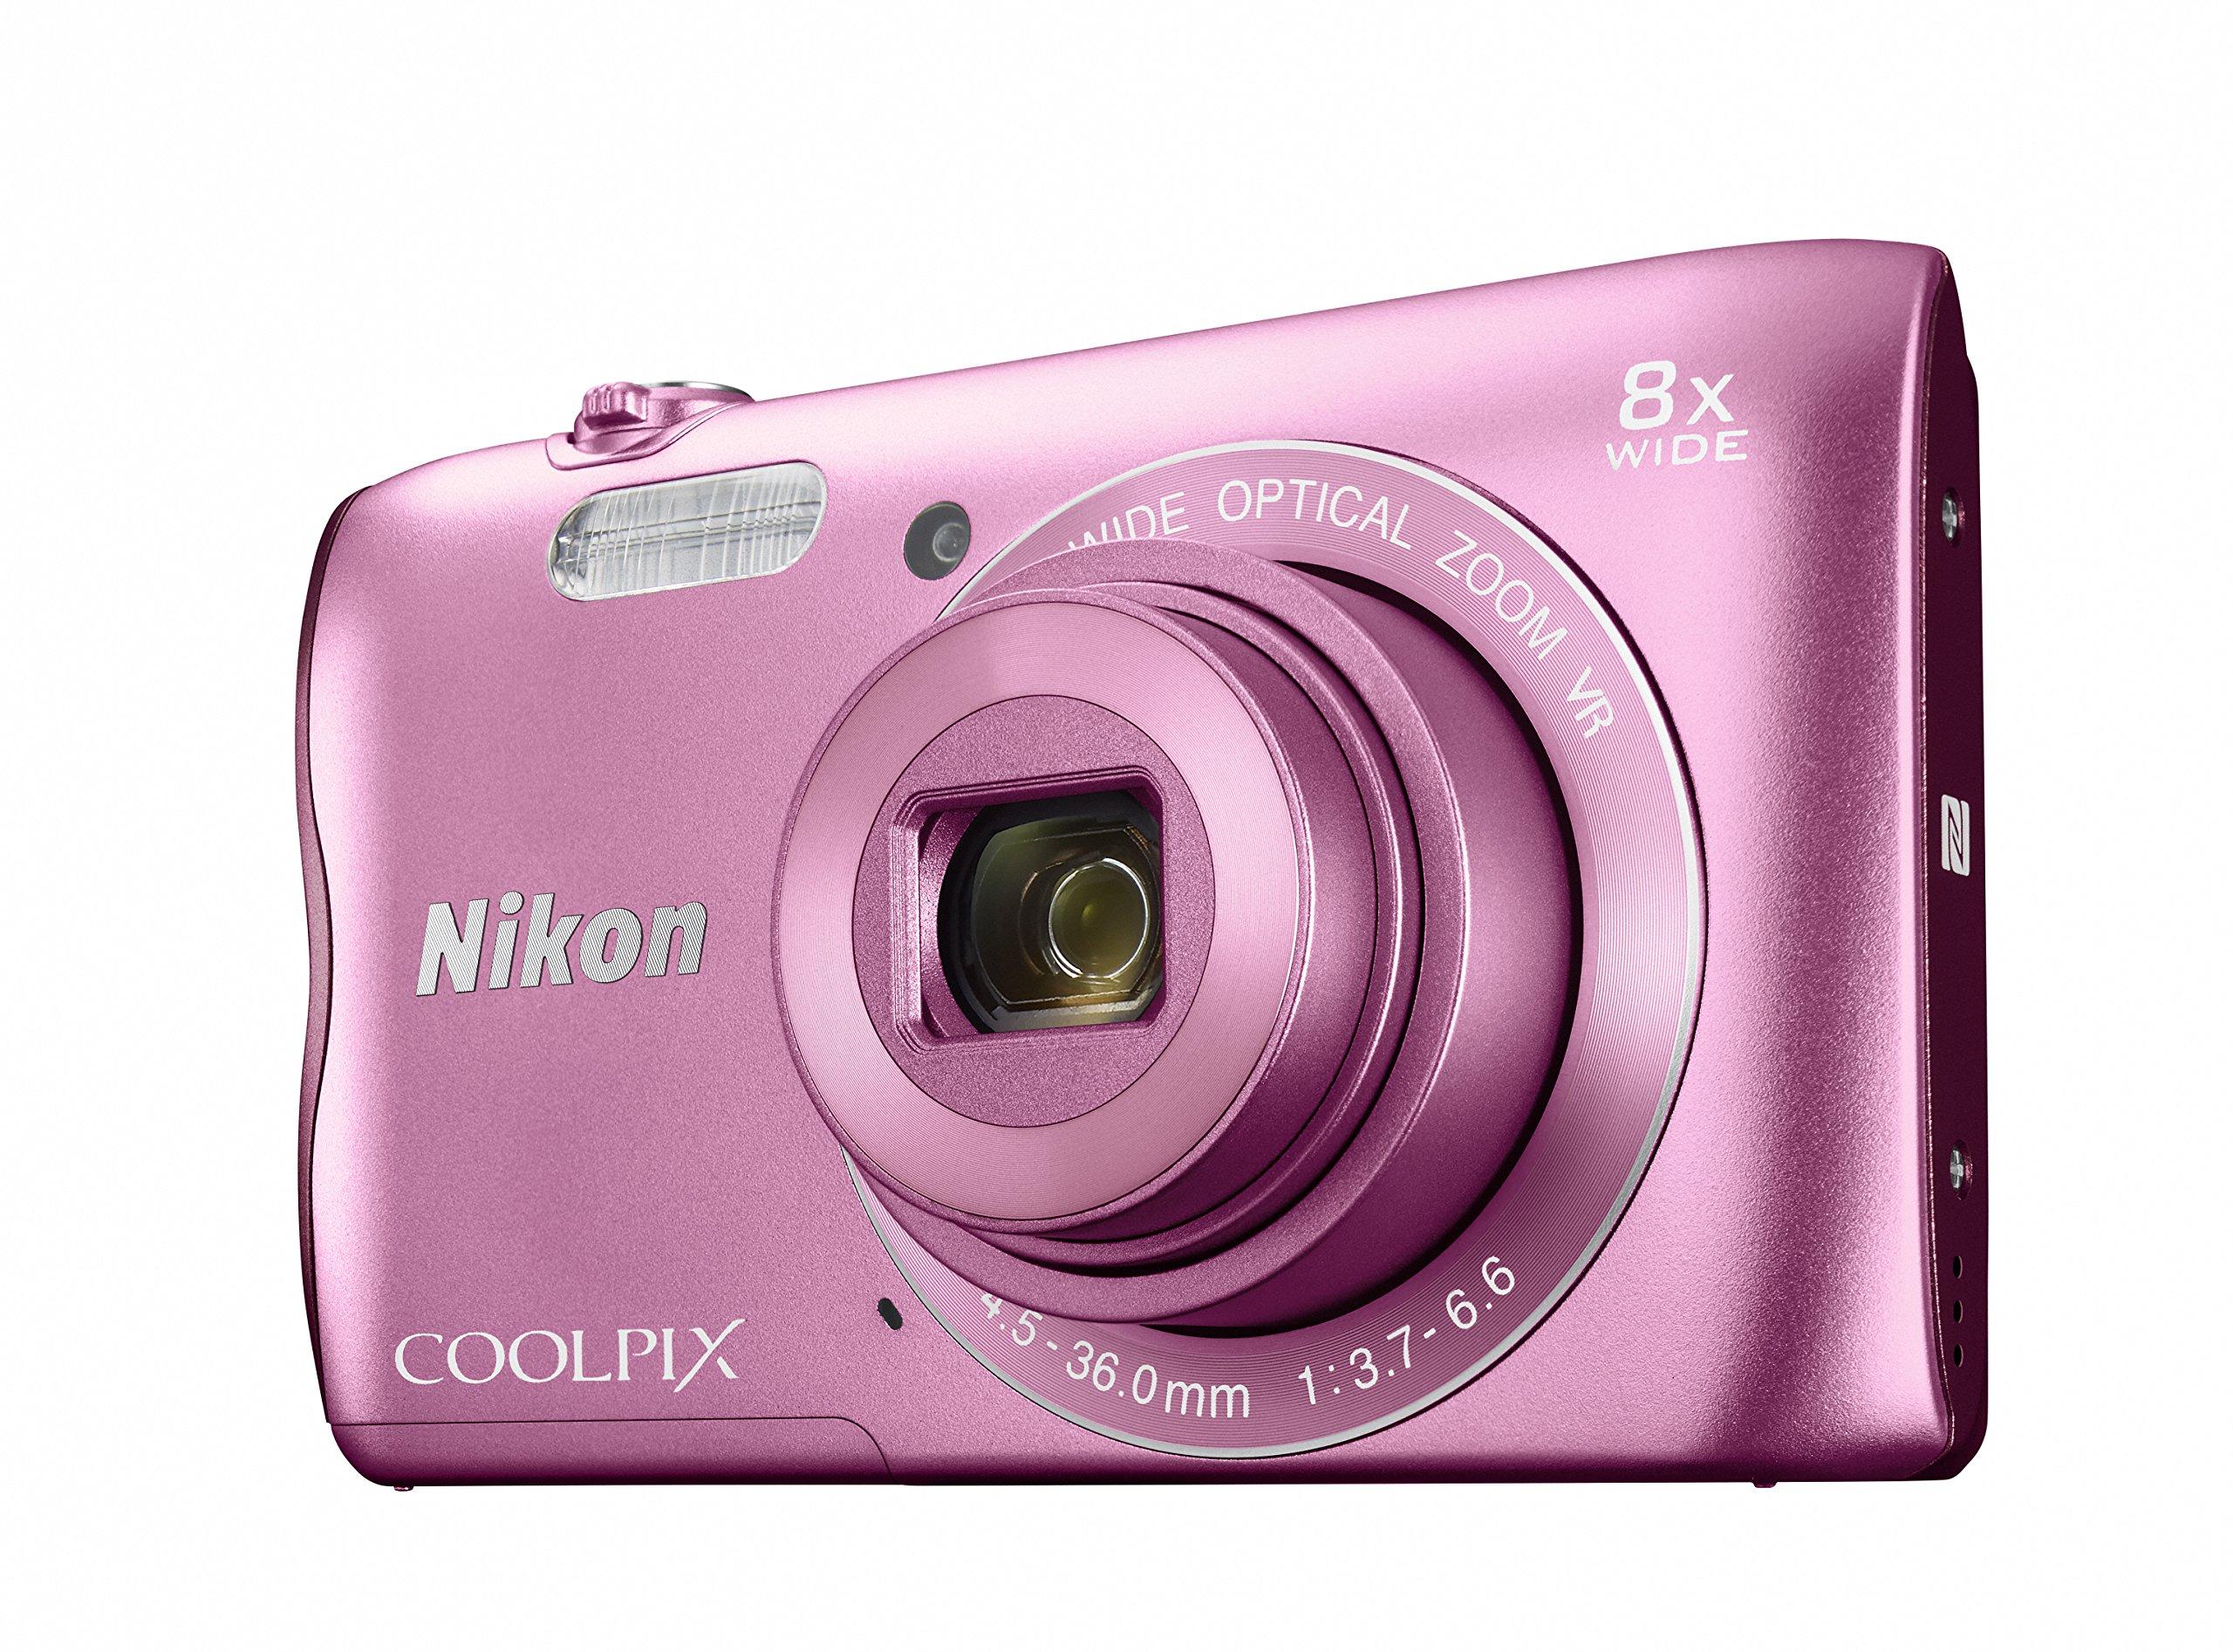 Nikon デジタルカメラ COOLPIX A300 光学8倍ズーム 2005万画素 ピンク